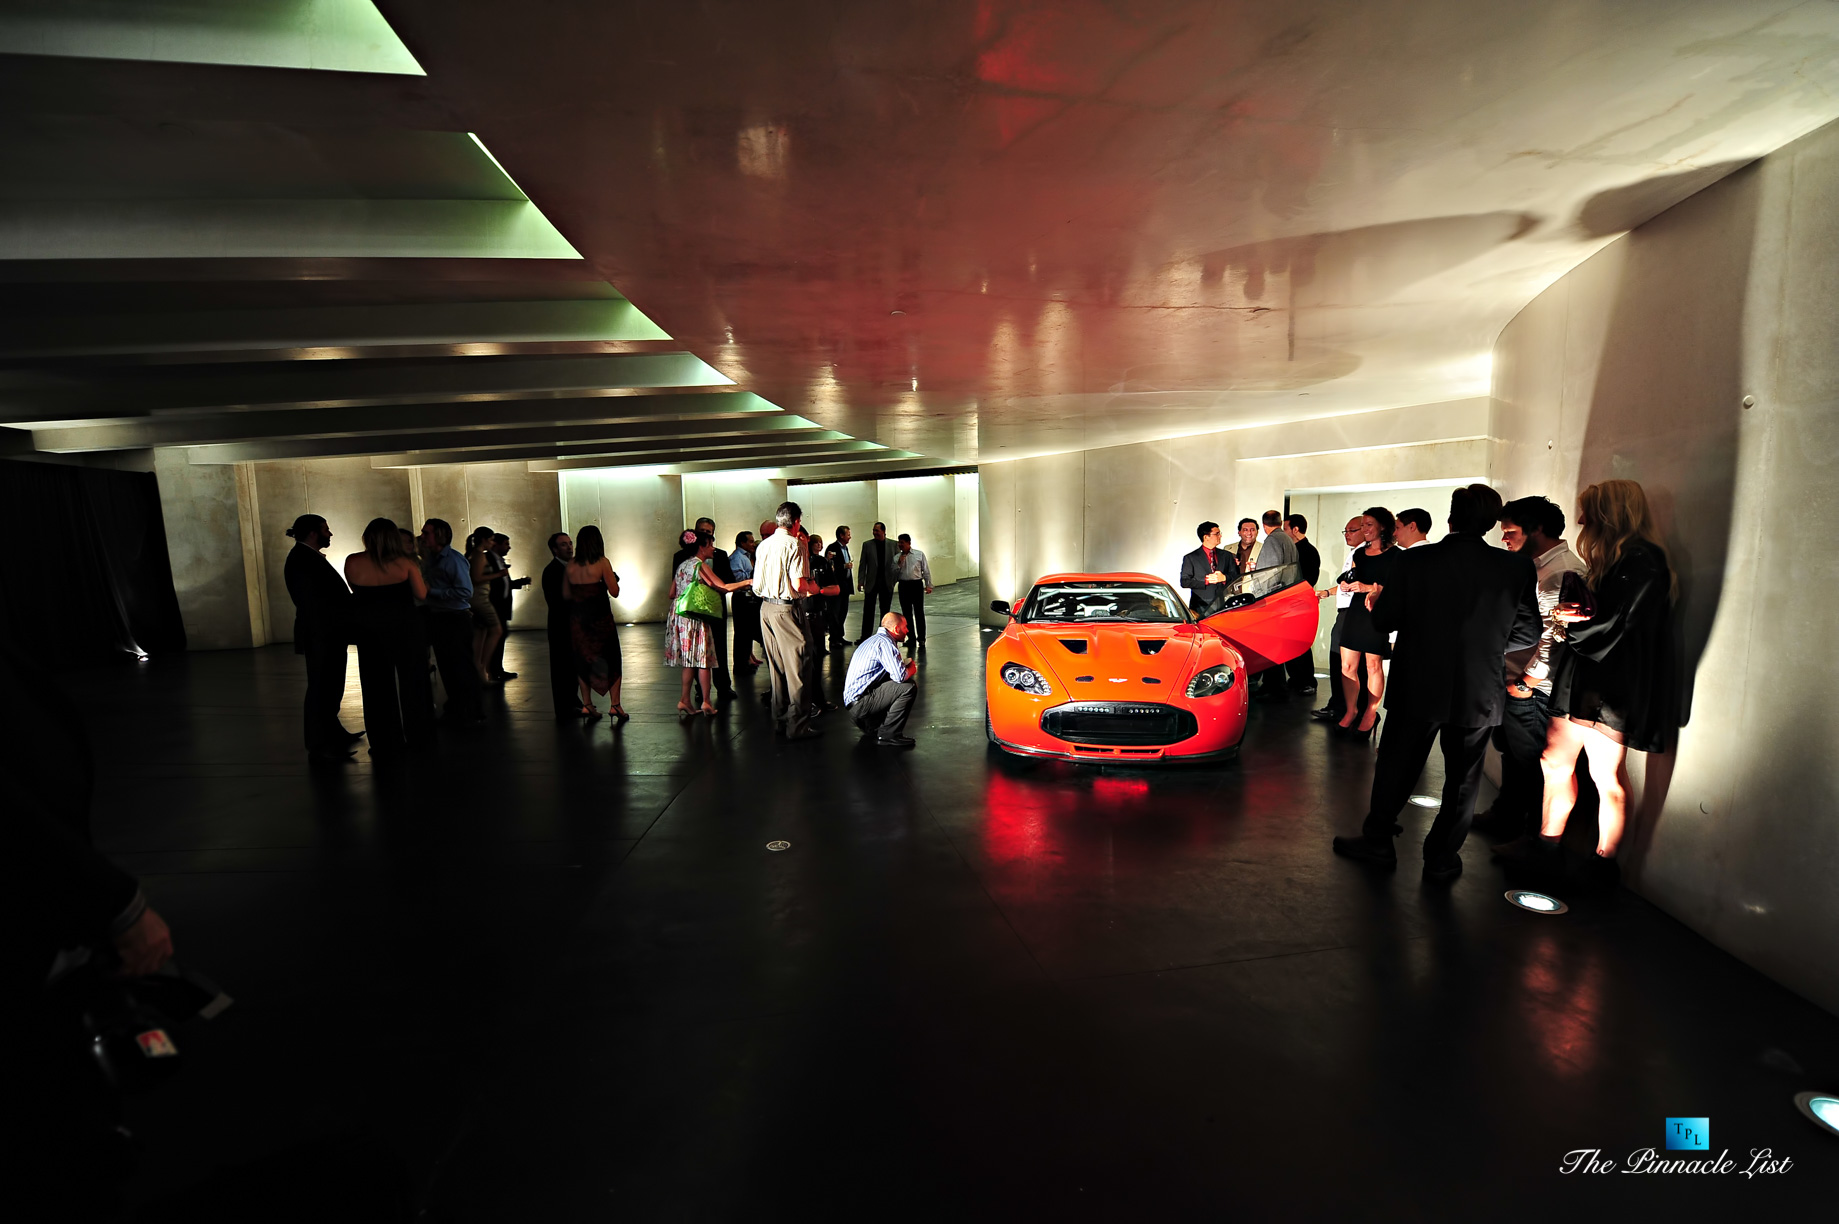 Aston Martin Reveals the V12 Zagato Supercar at The Razor Residence